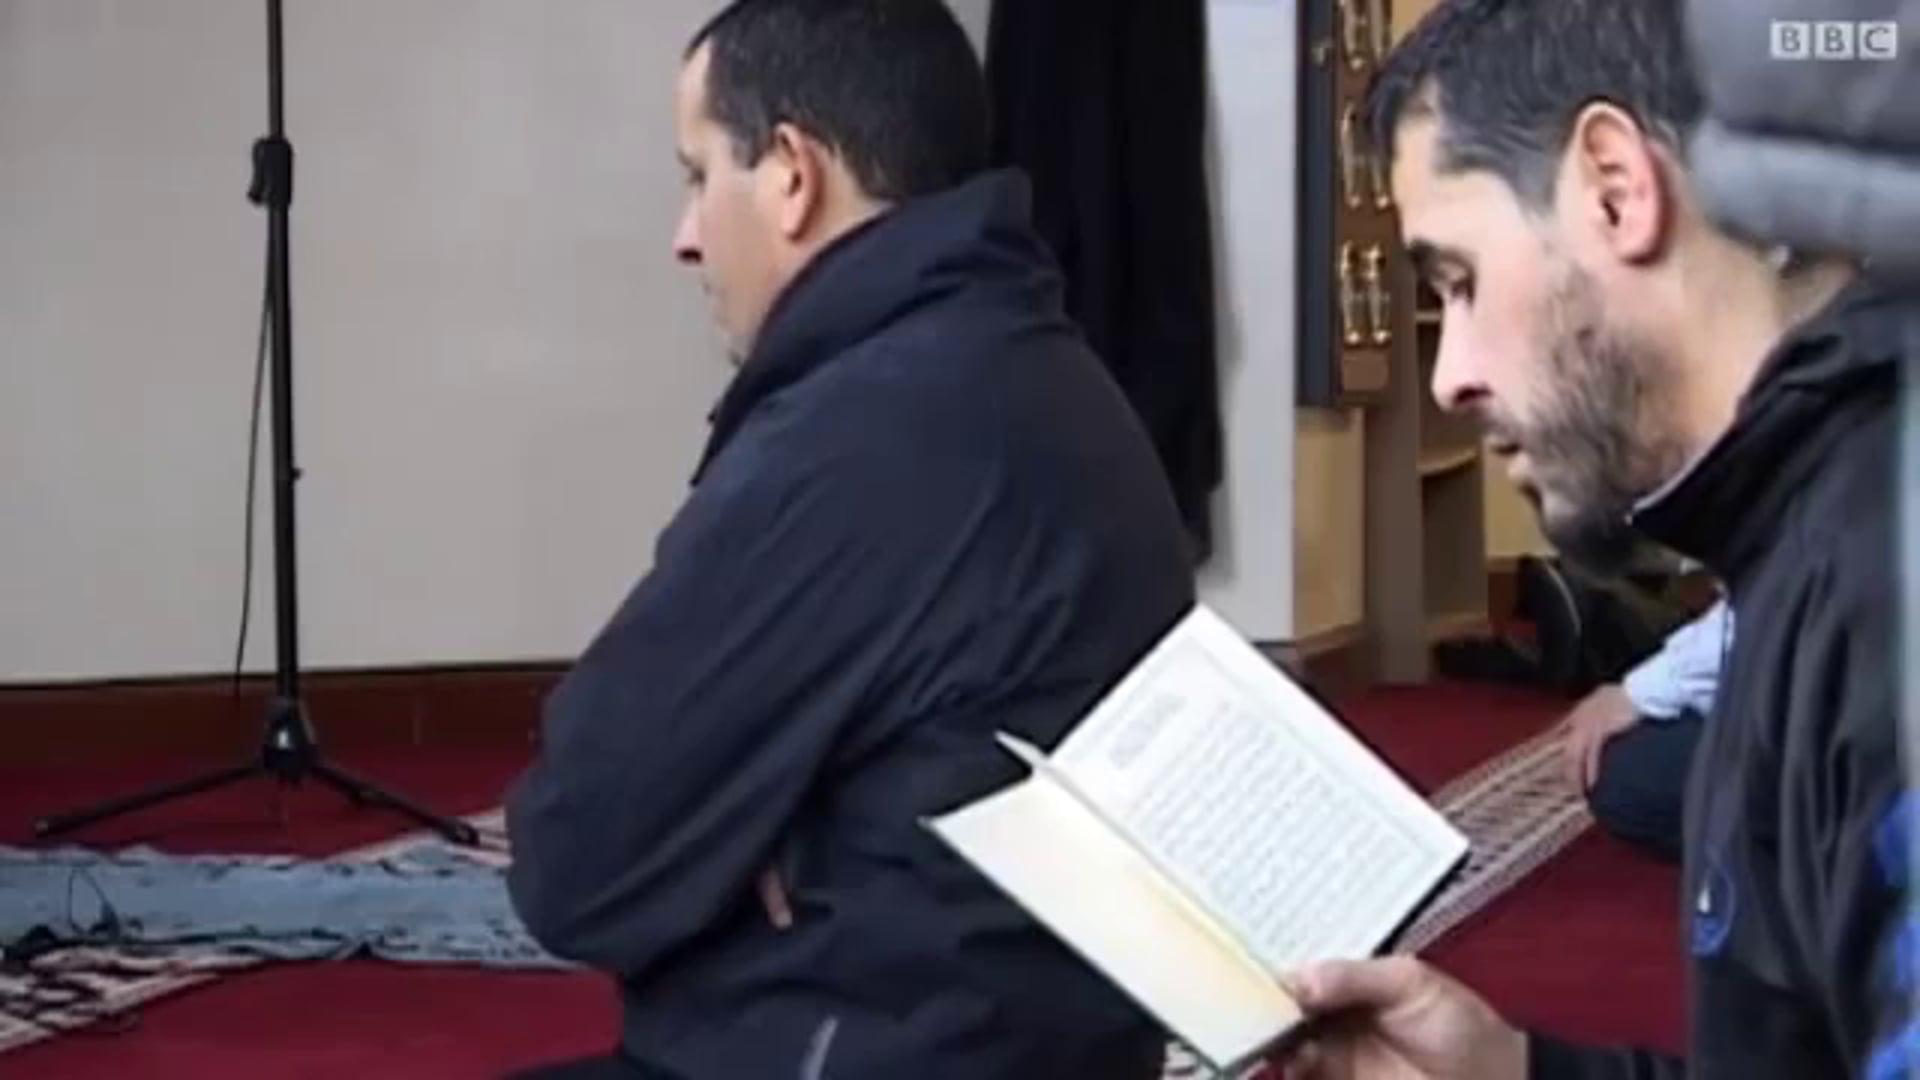 Ahmed Maher, bbc